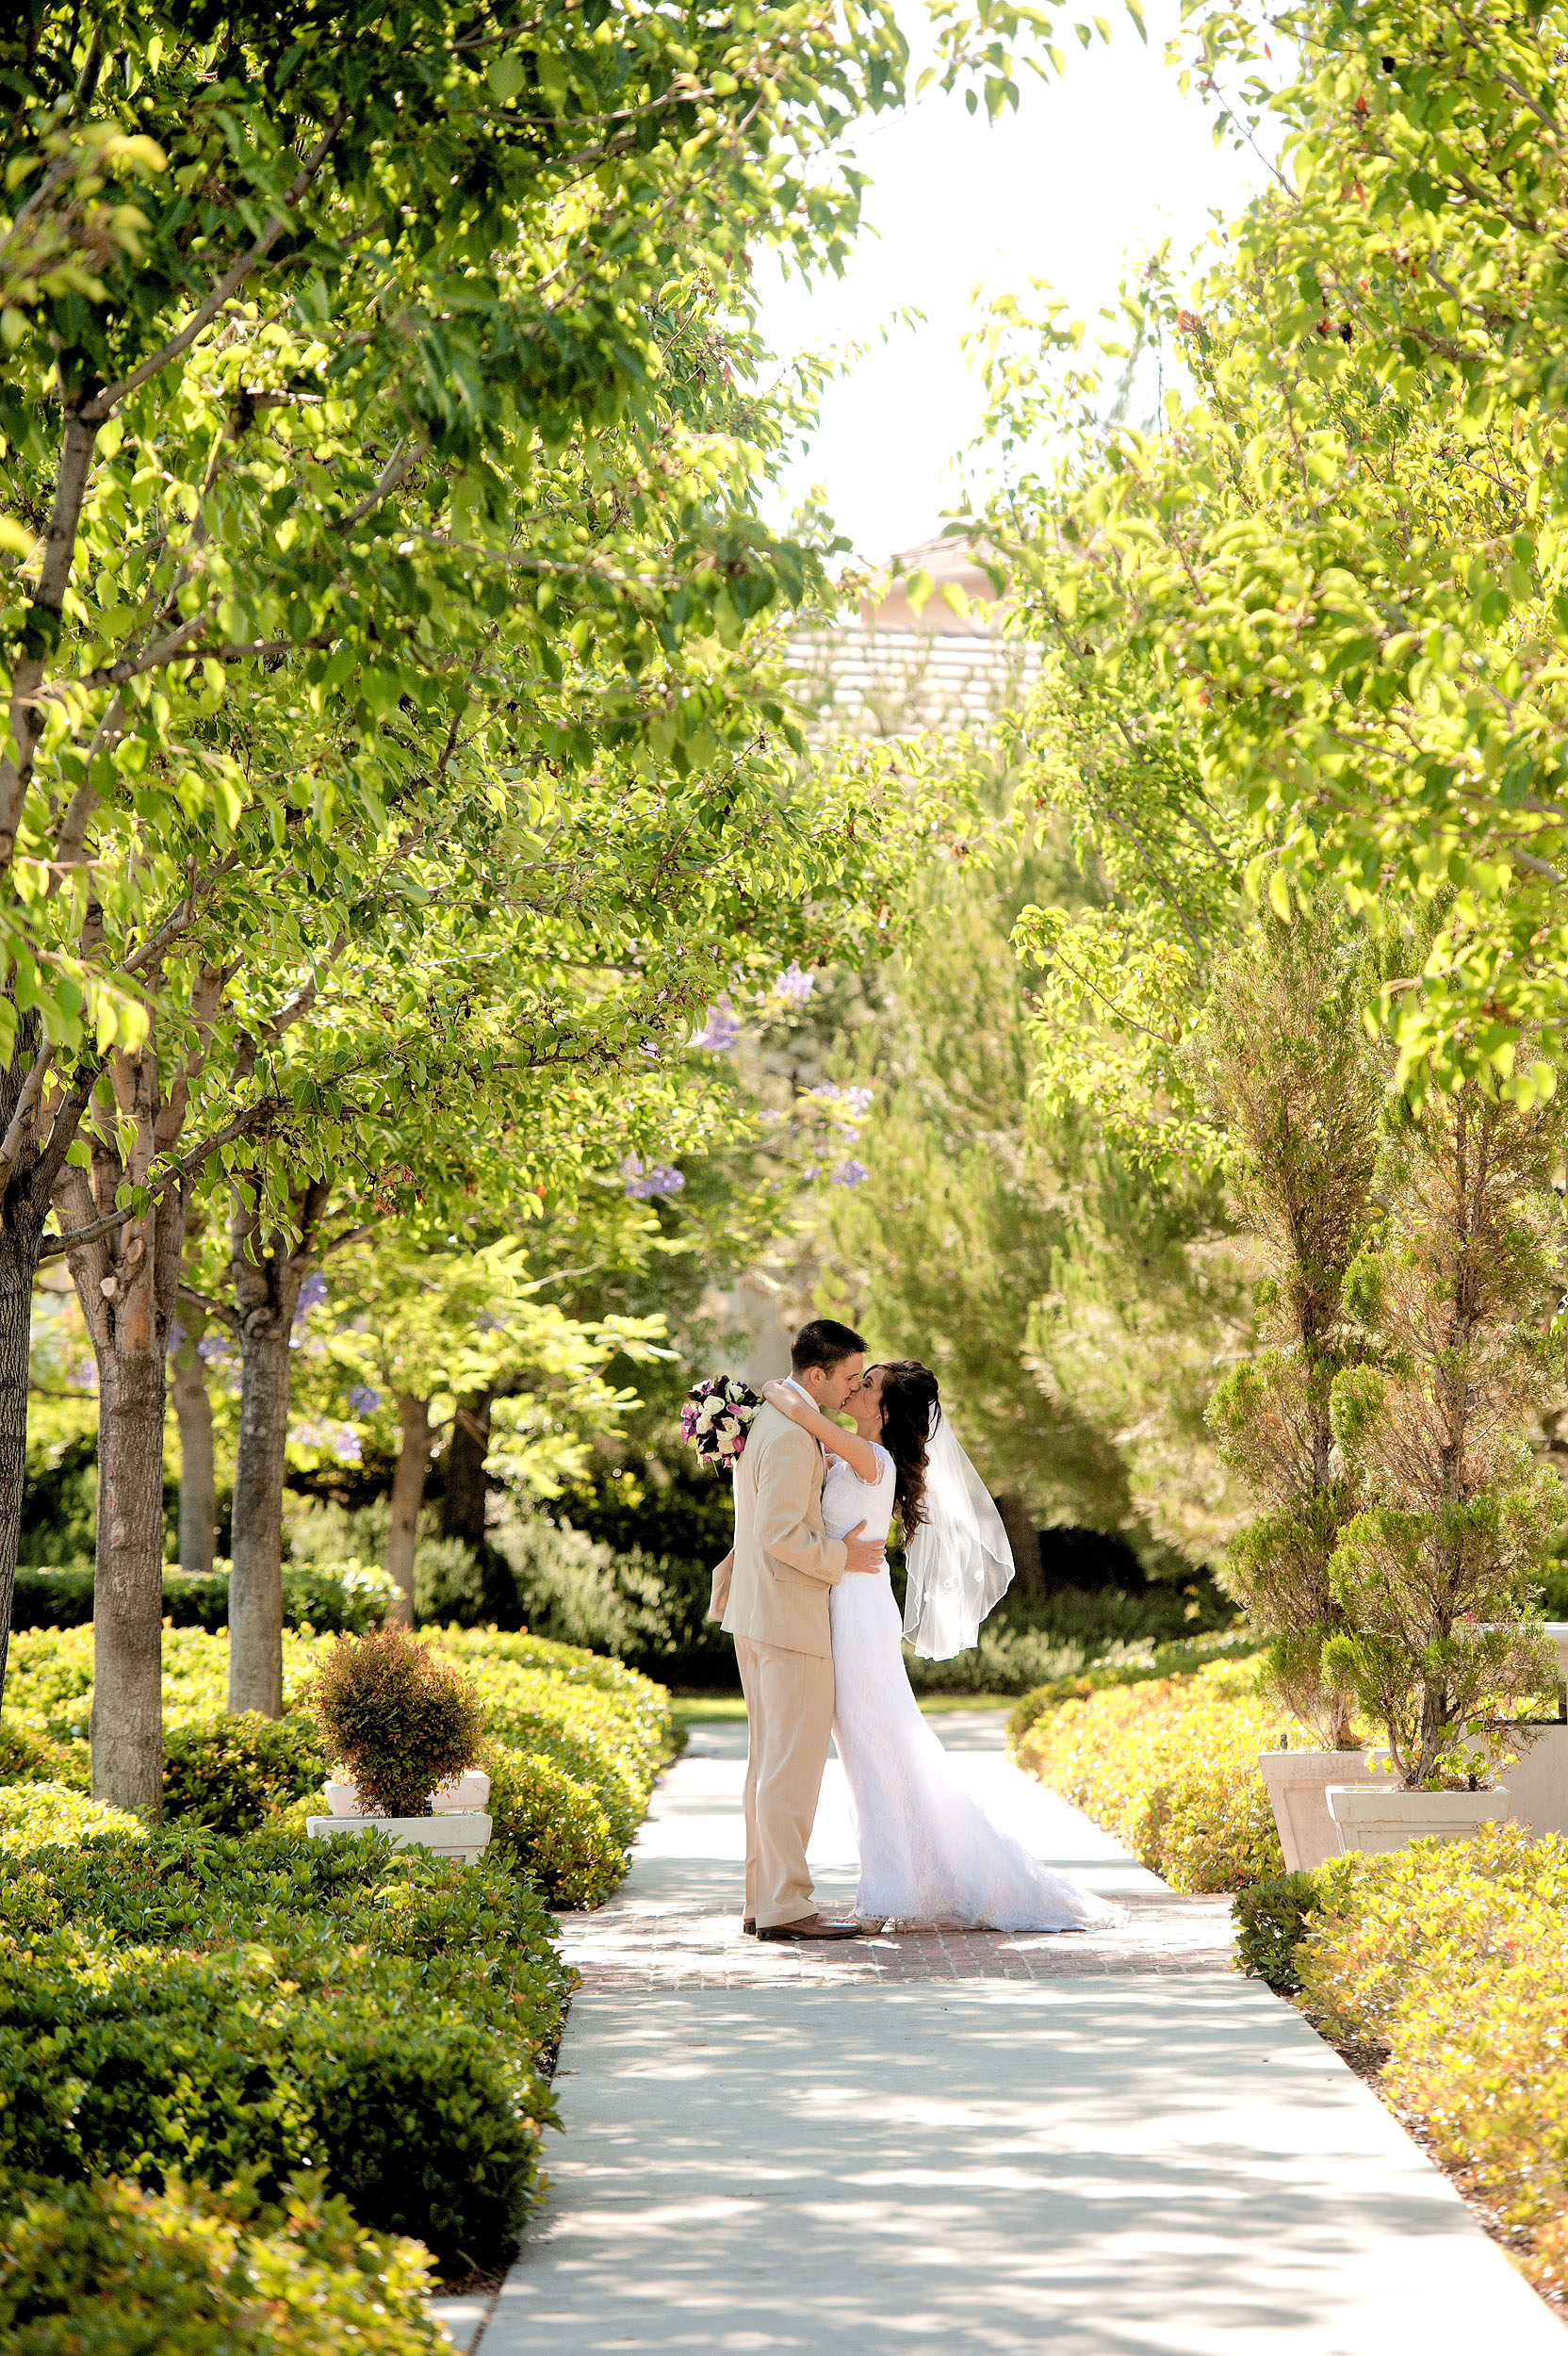 Bride and groom kissing at Harveston Lake Park in Temecula.